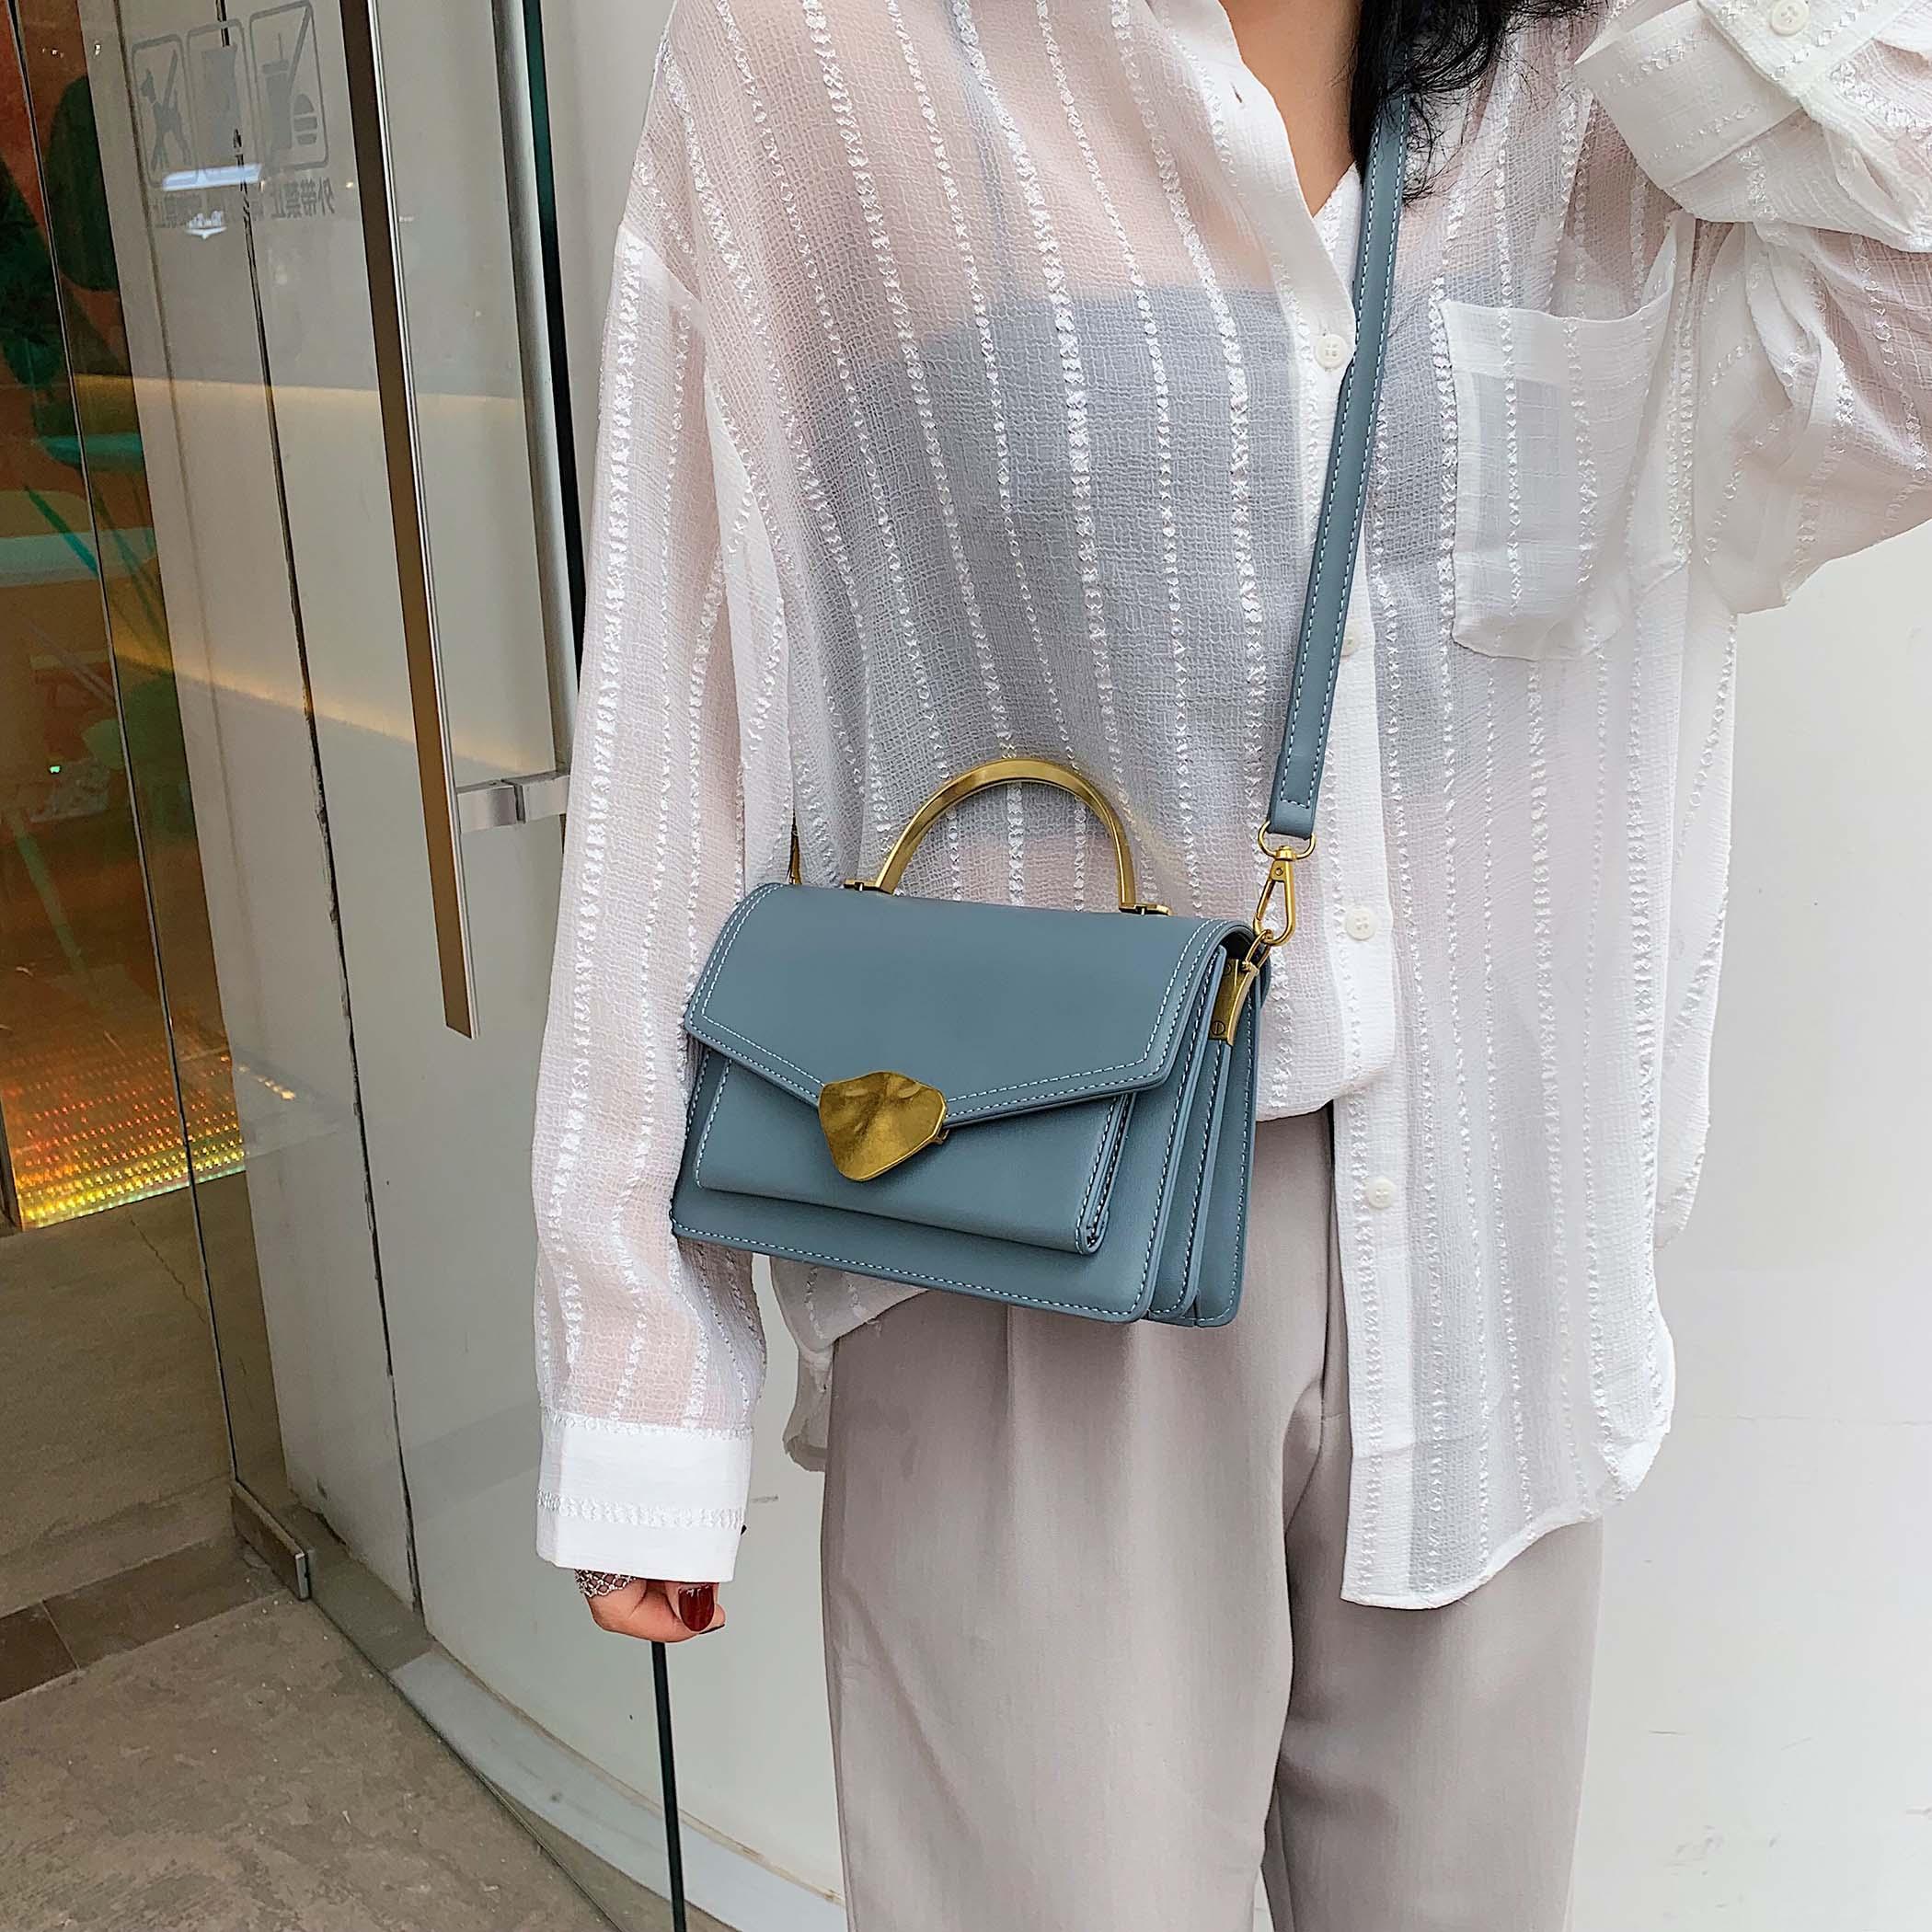 Image 3 - Simply Style PU Leather Crossbody Bags For Women Shoulder Messenger Bag Handbag Mini Tote Hand Bag With Metal Handle-in Shoulder Bags from Luggage & Bags